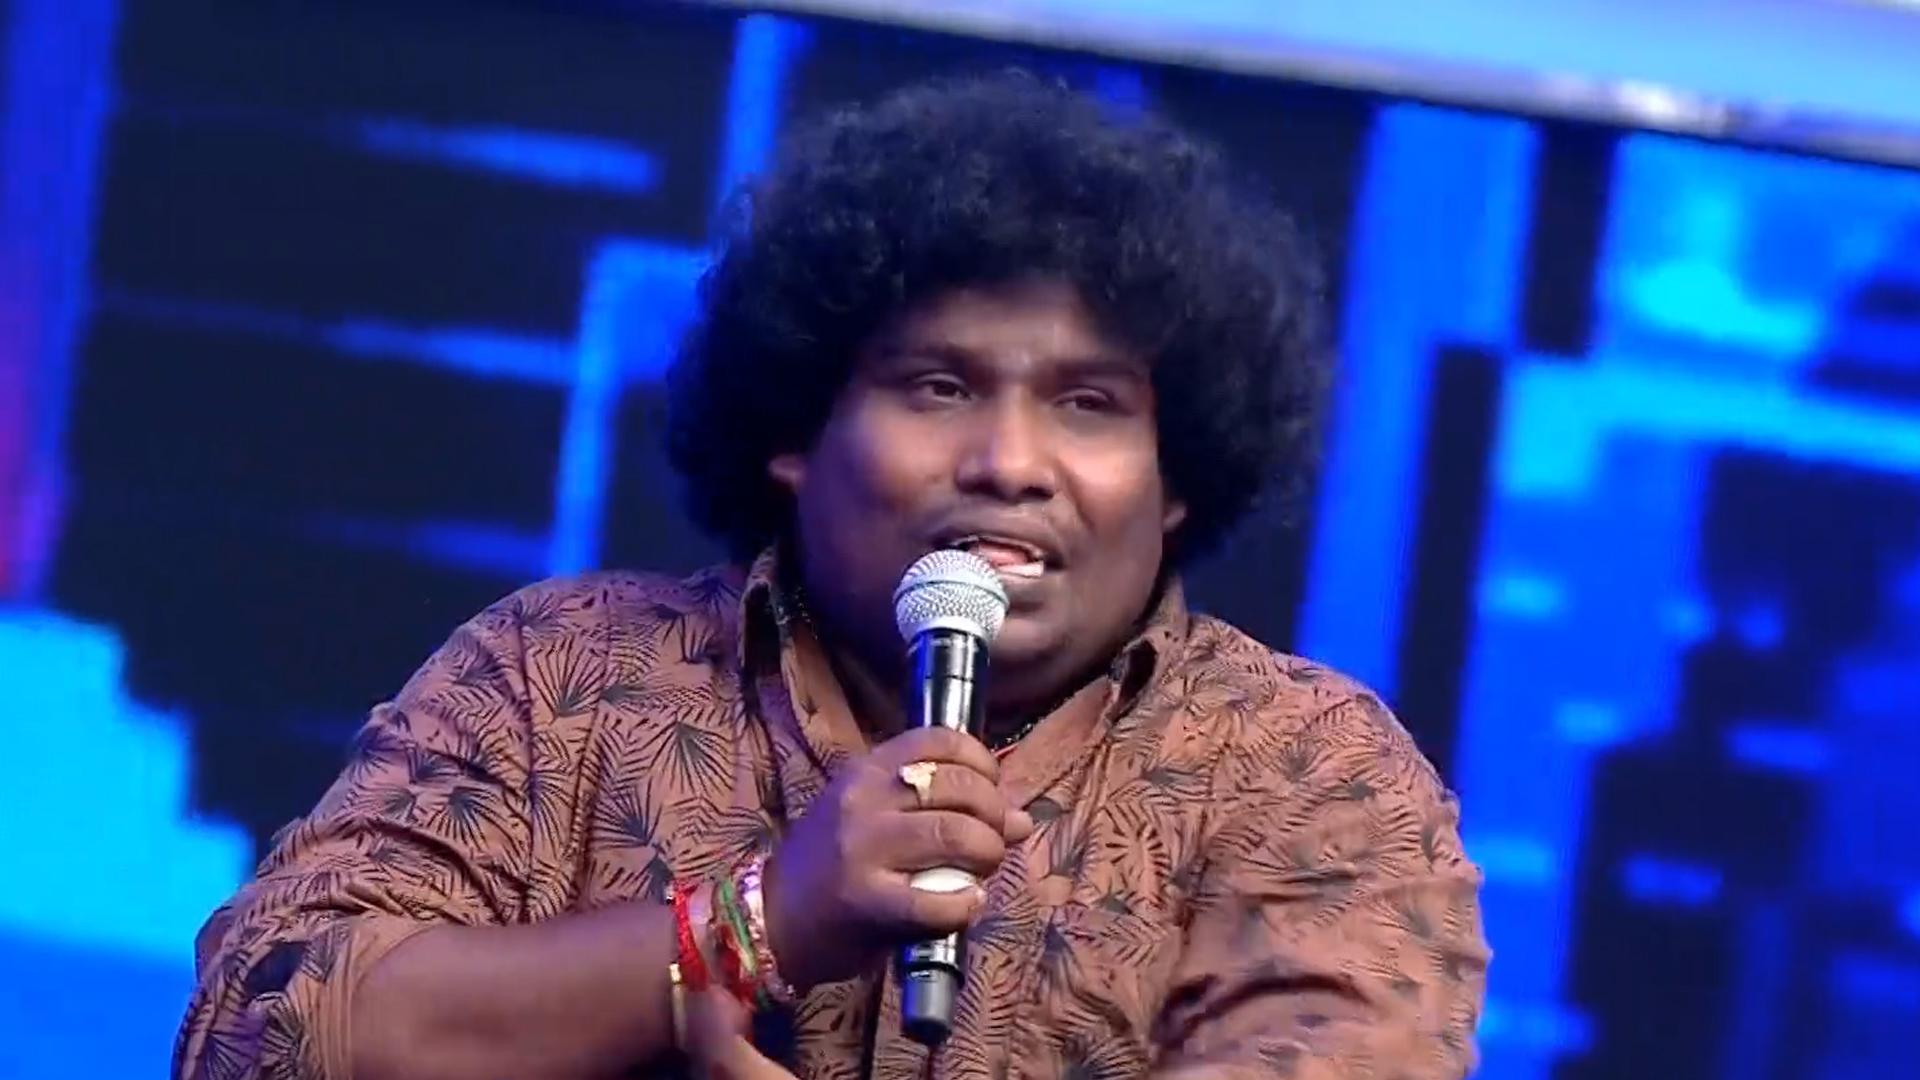 Yogi Babu at Sarkar audio launch